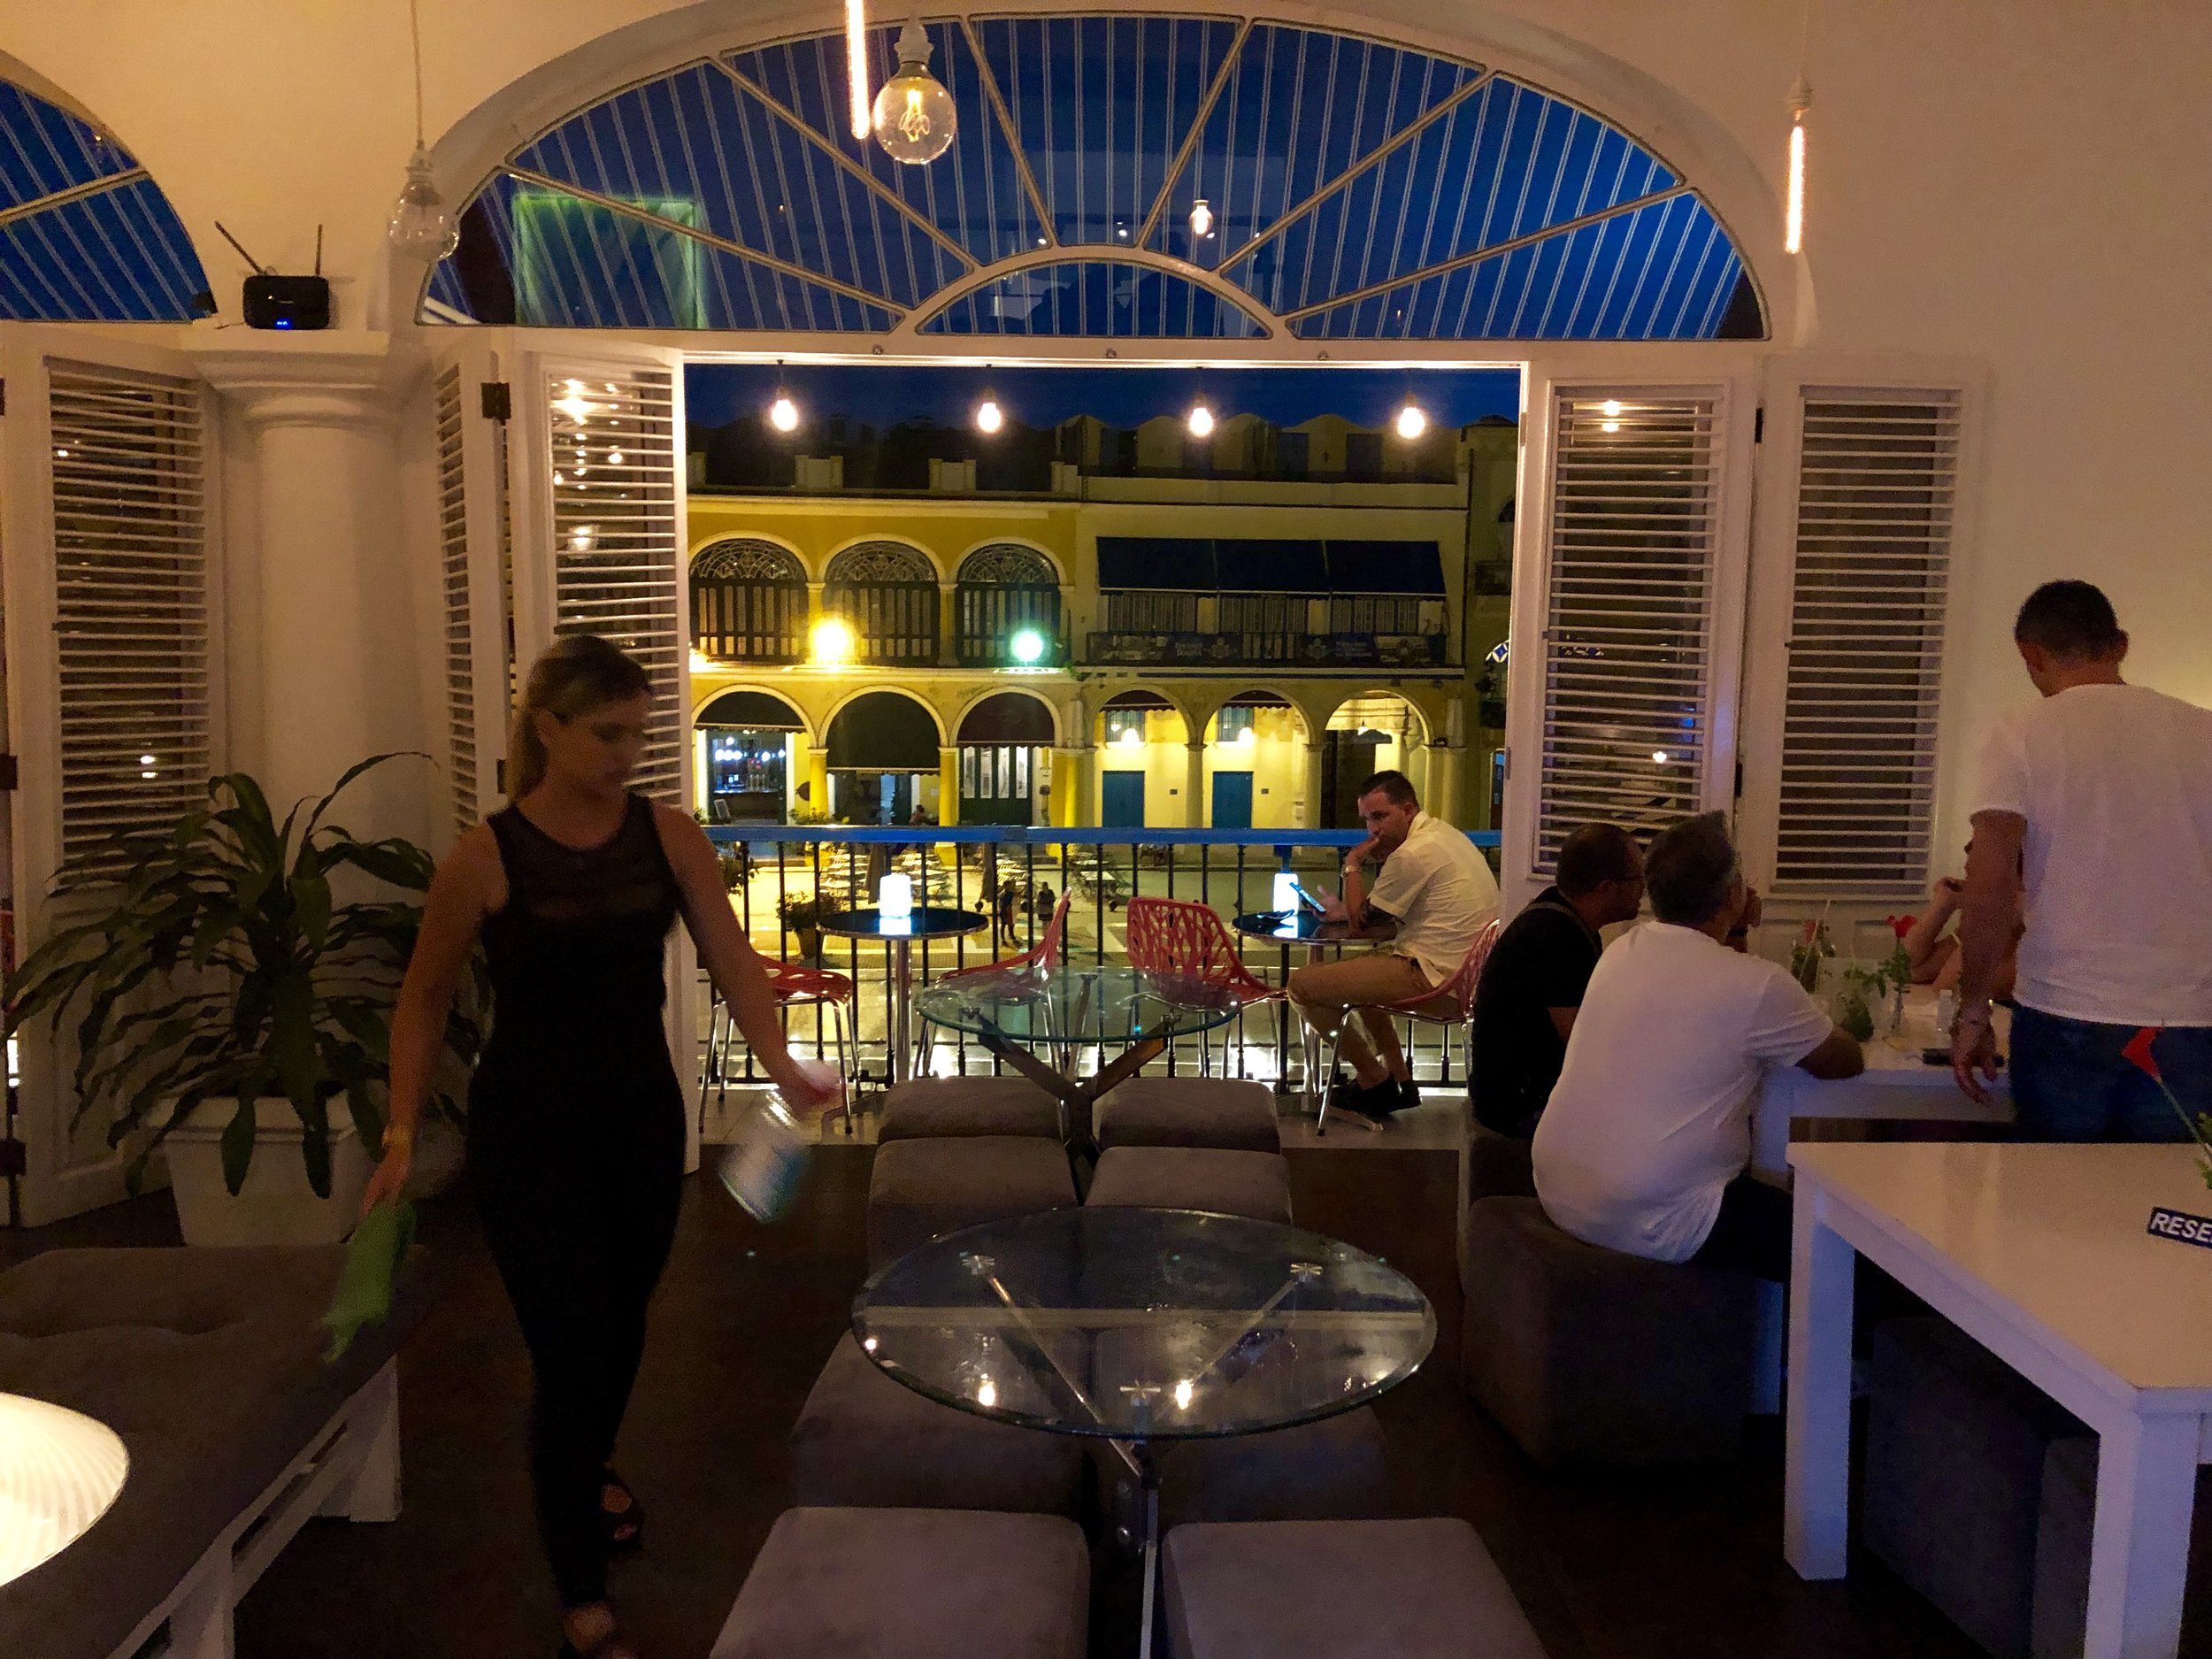 Cuba bars (Sugar bar), Kaitlyn Alkass.jpeg